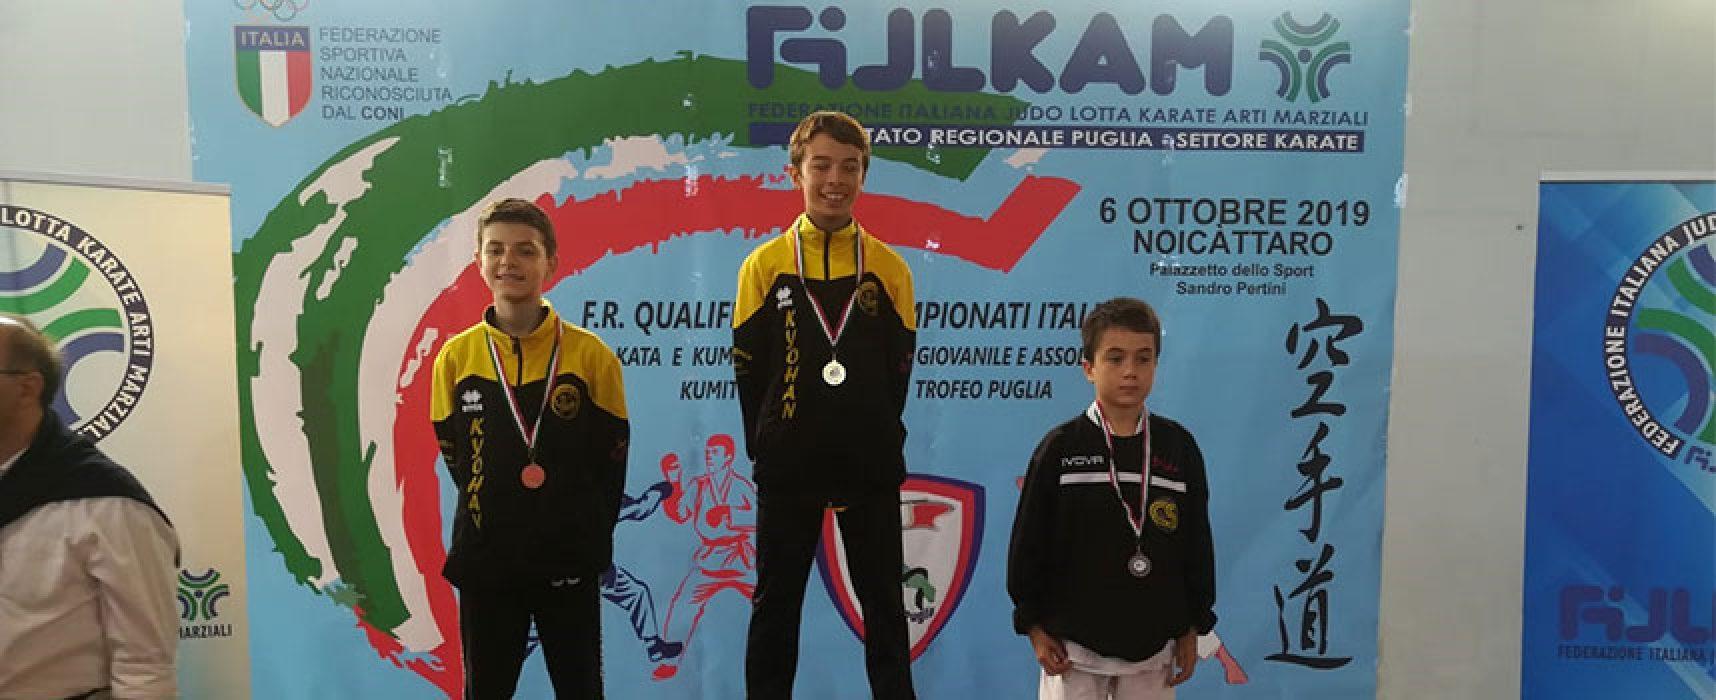 Il biscegliese Federico Papagni campione regionale Esordienti di kumite